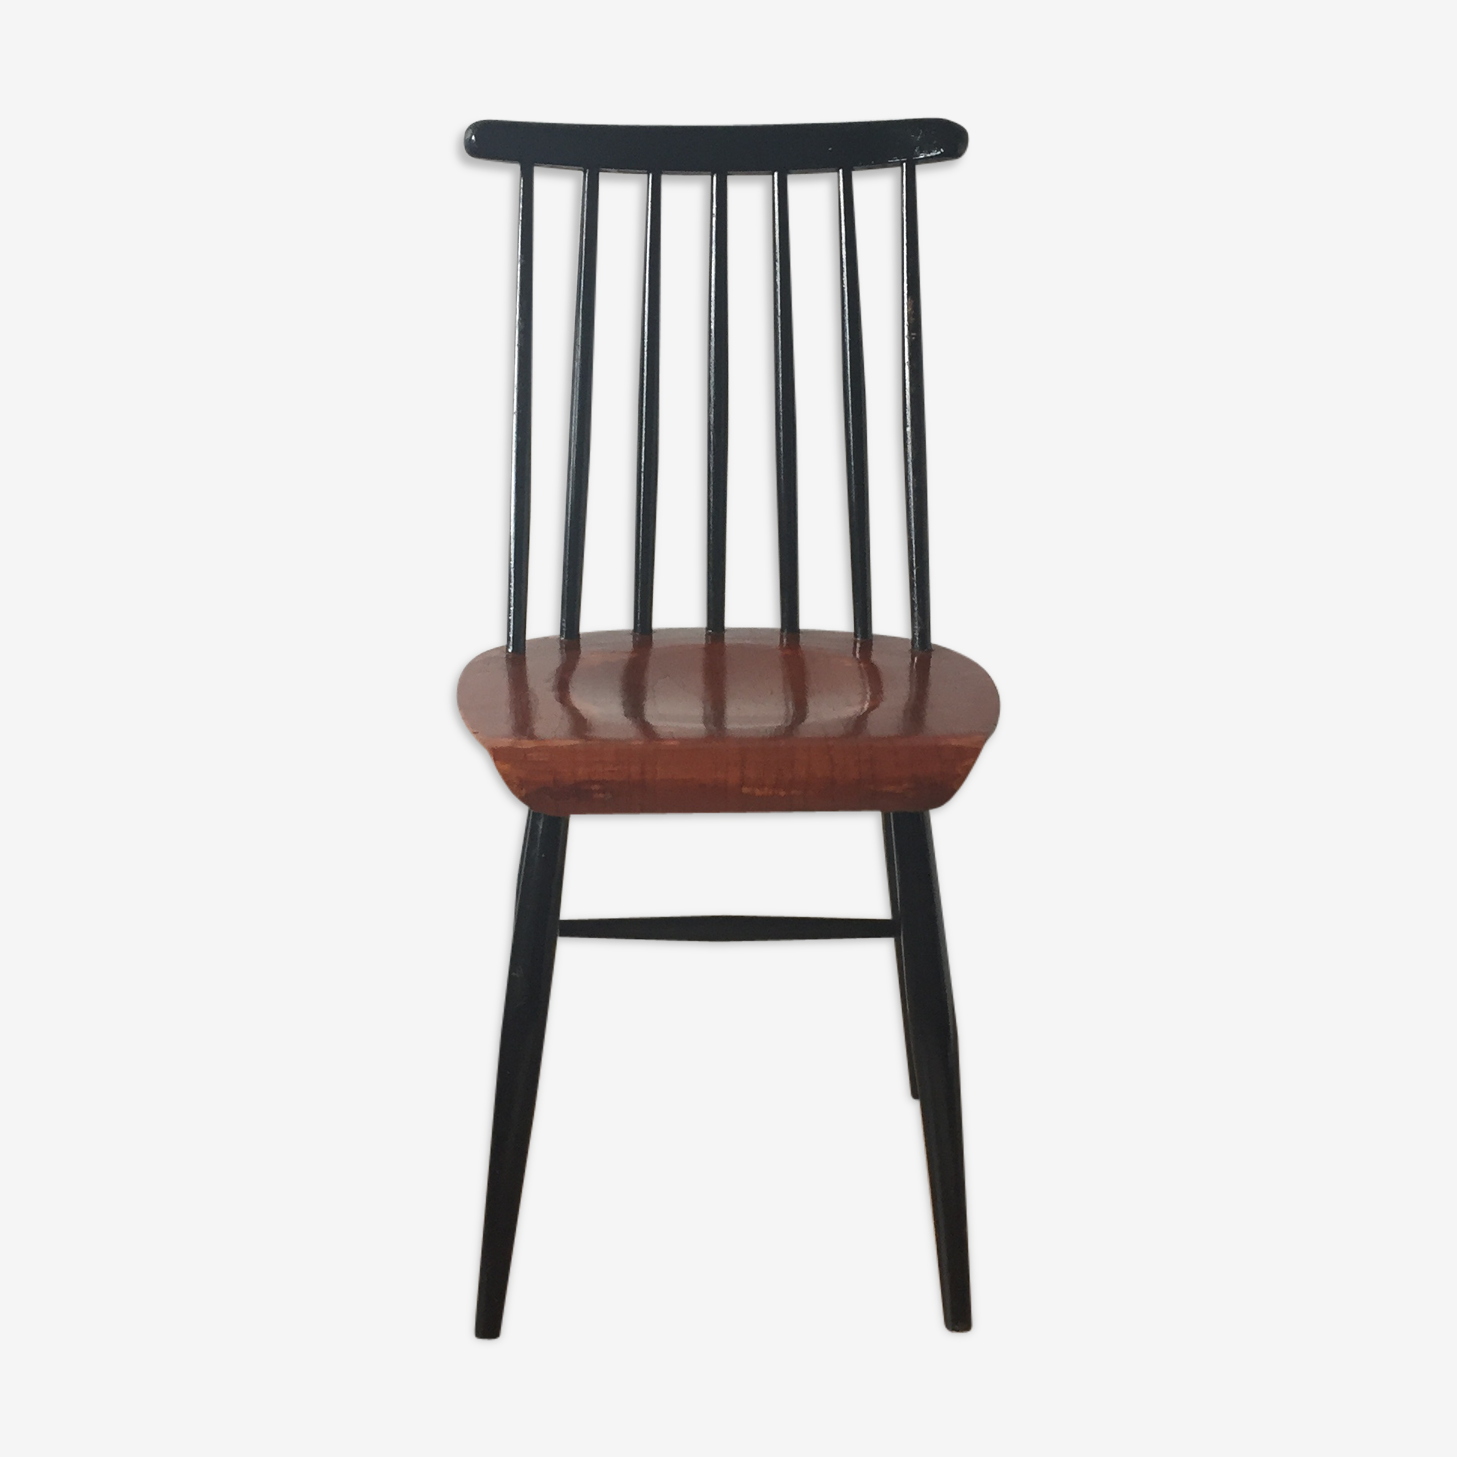 Scandinavian chair Tapiovaara